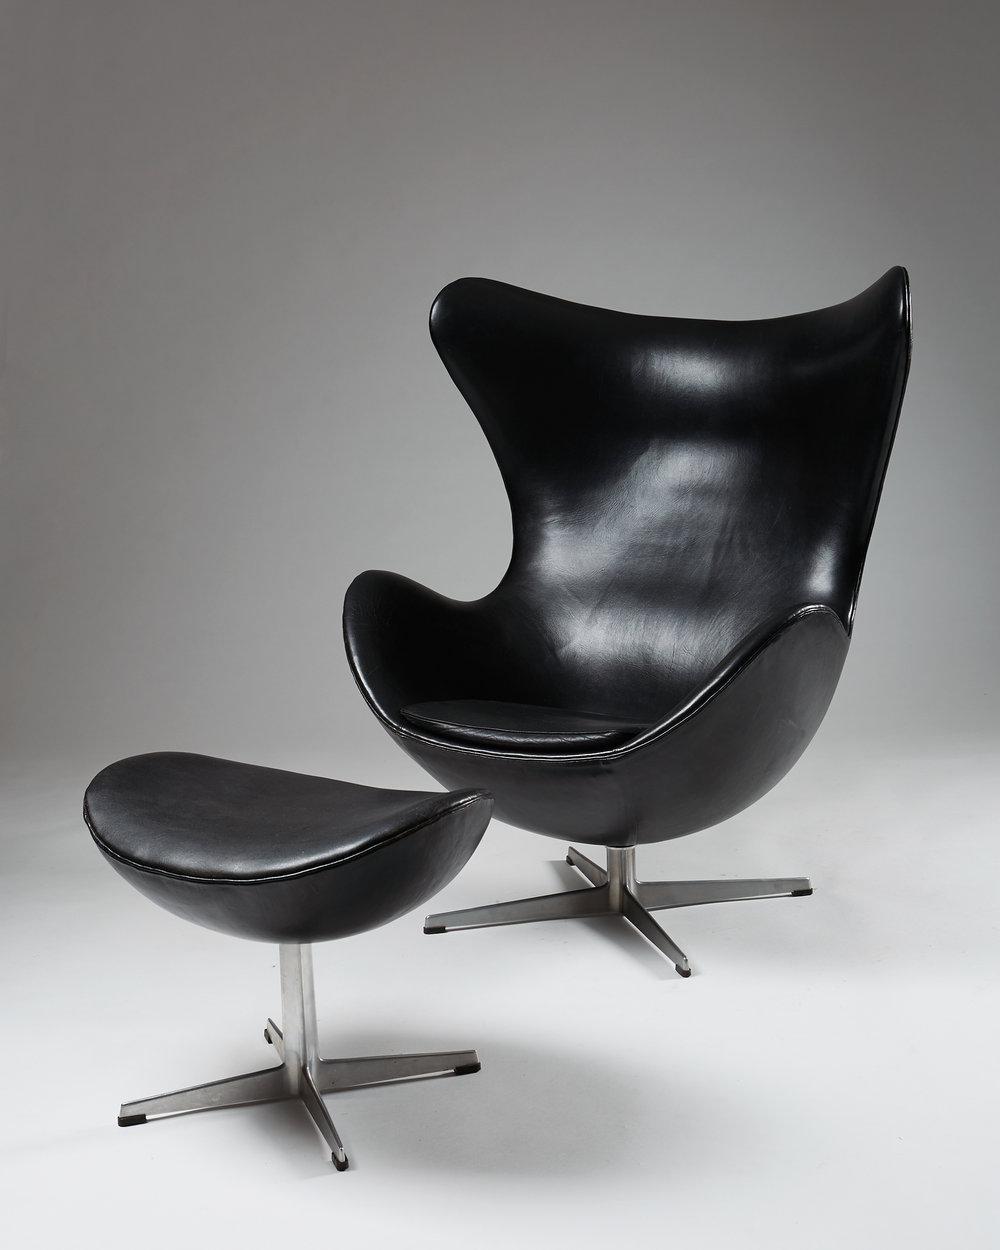 Arne Jacobsen  The Egg Denmark, 1958 Leather and aluminium. 106 x 72 x 82 cm Seat: 35 cm